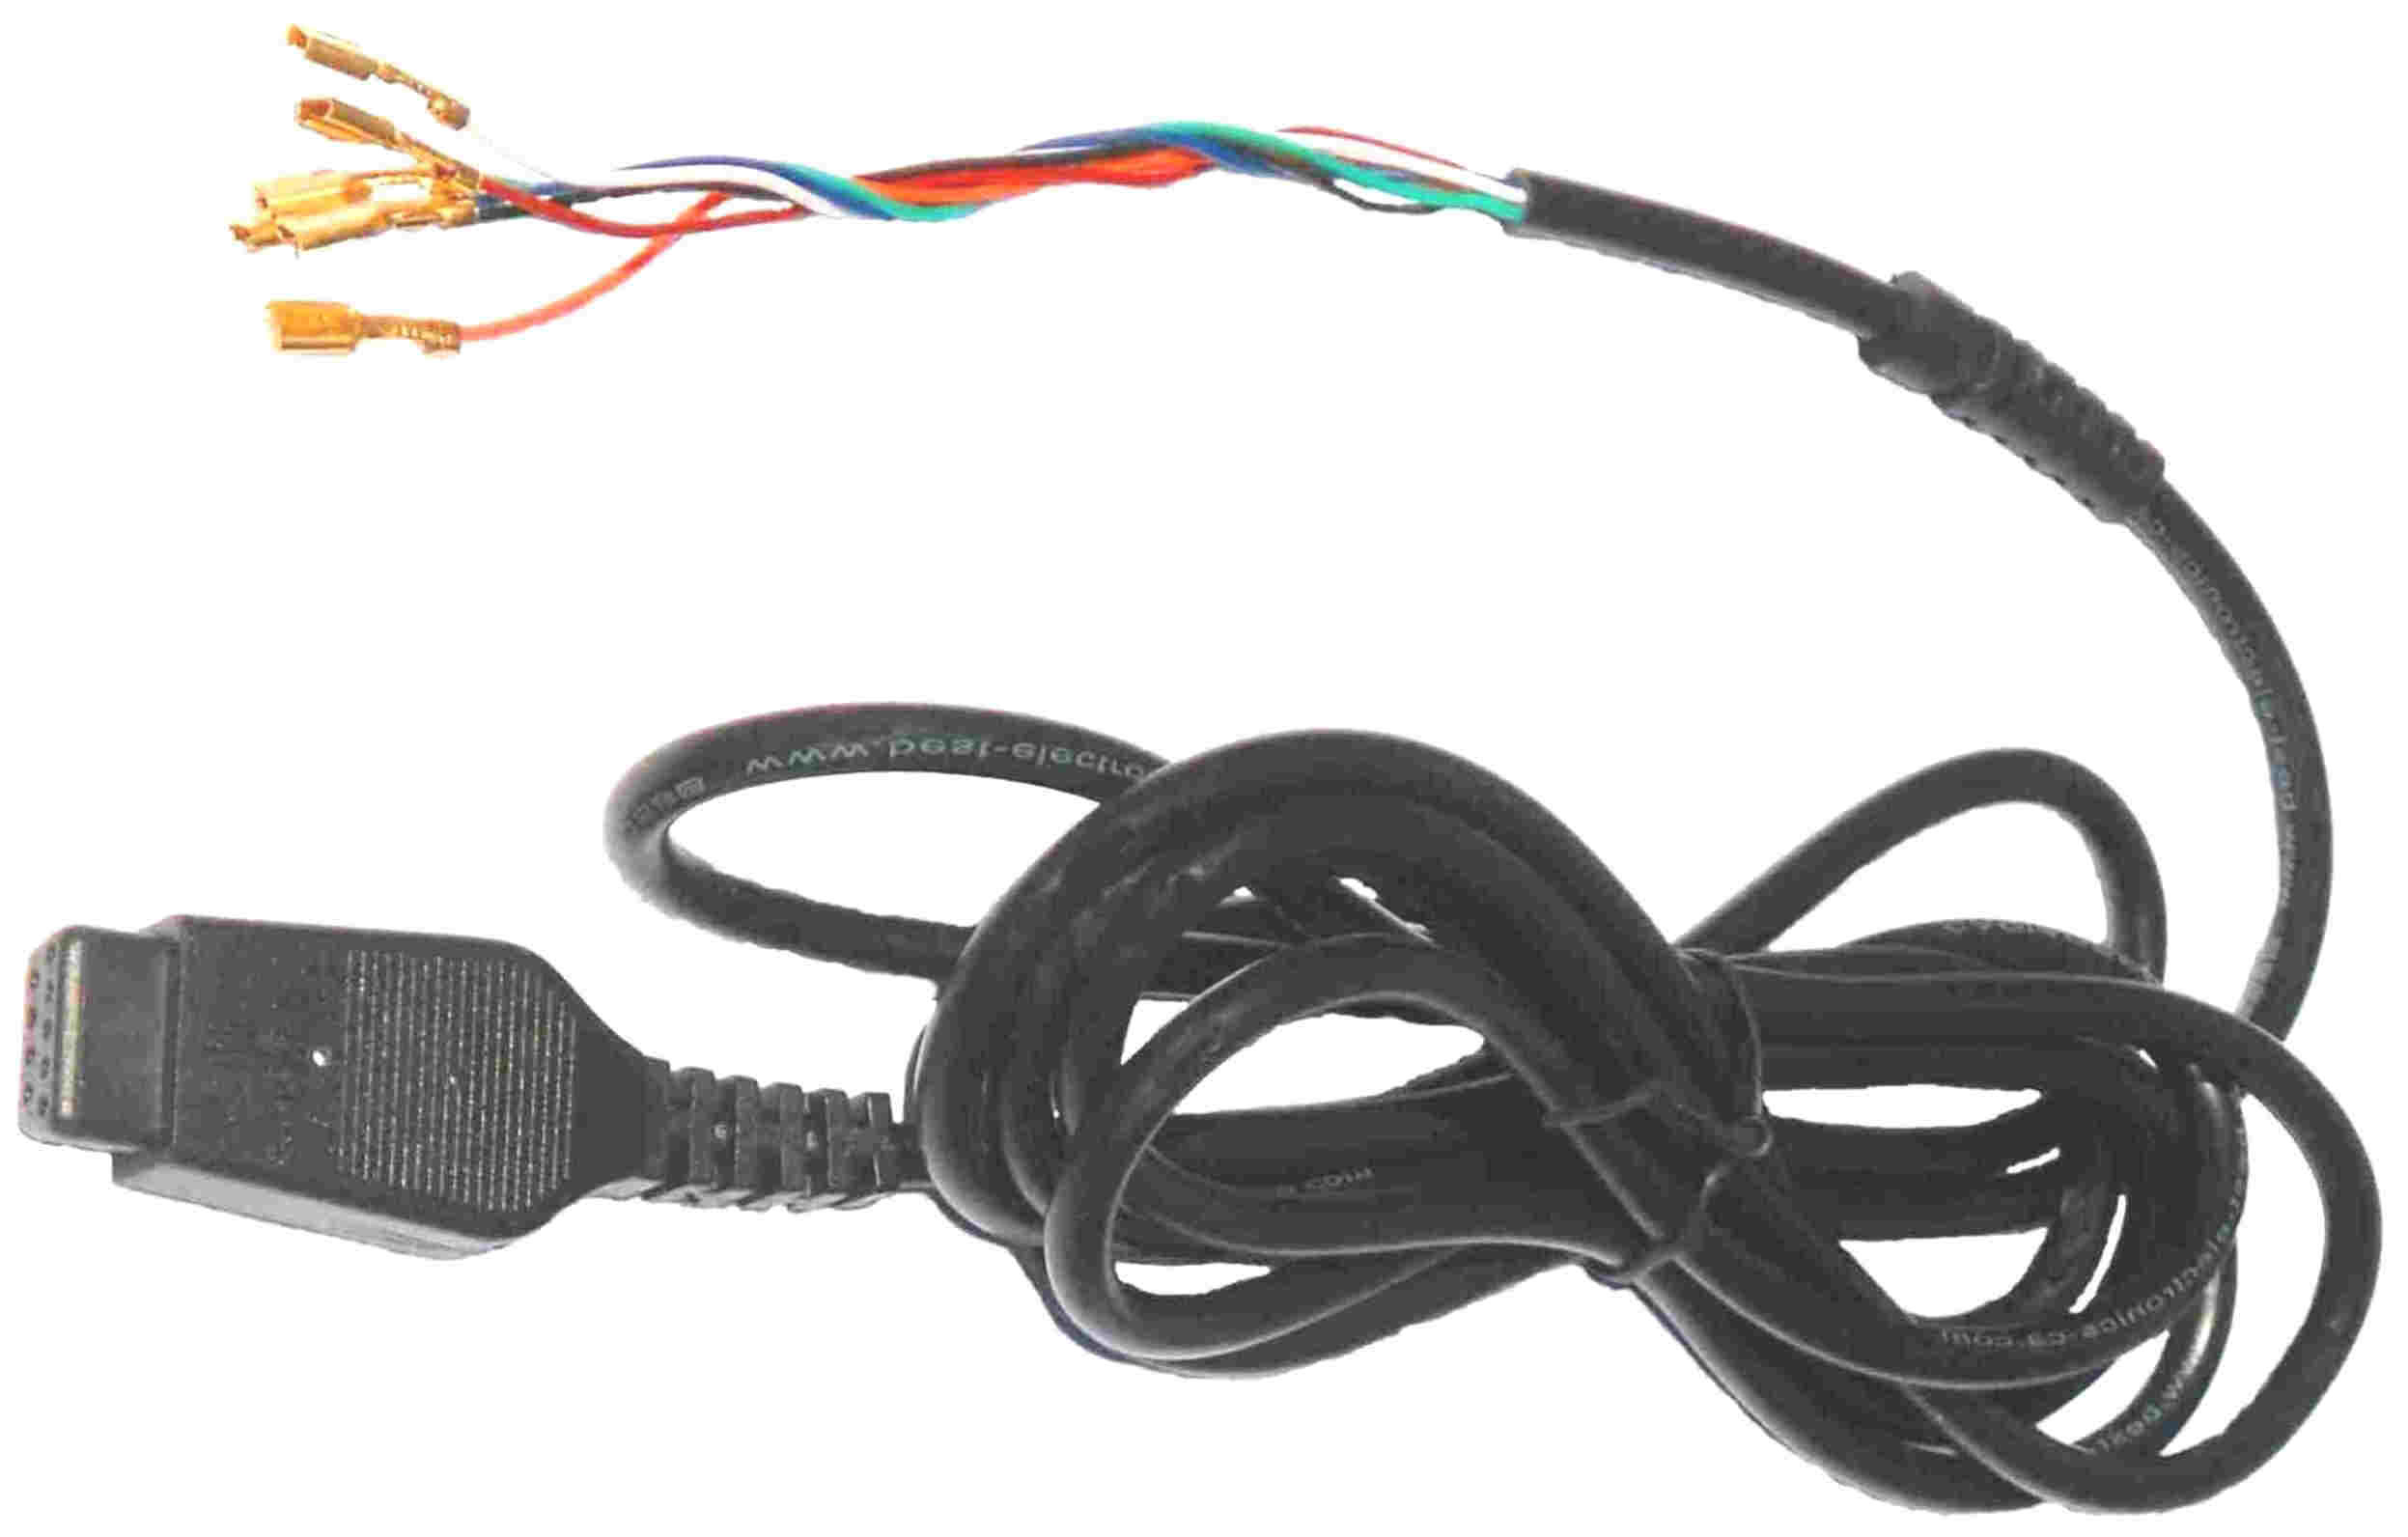 Atari 2600 Joystick Wiring Diagram